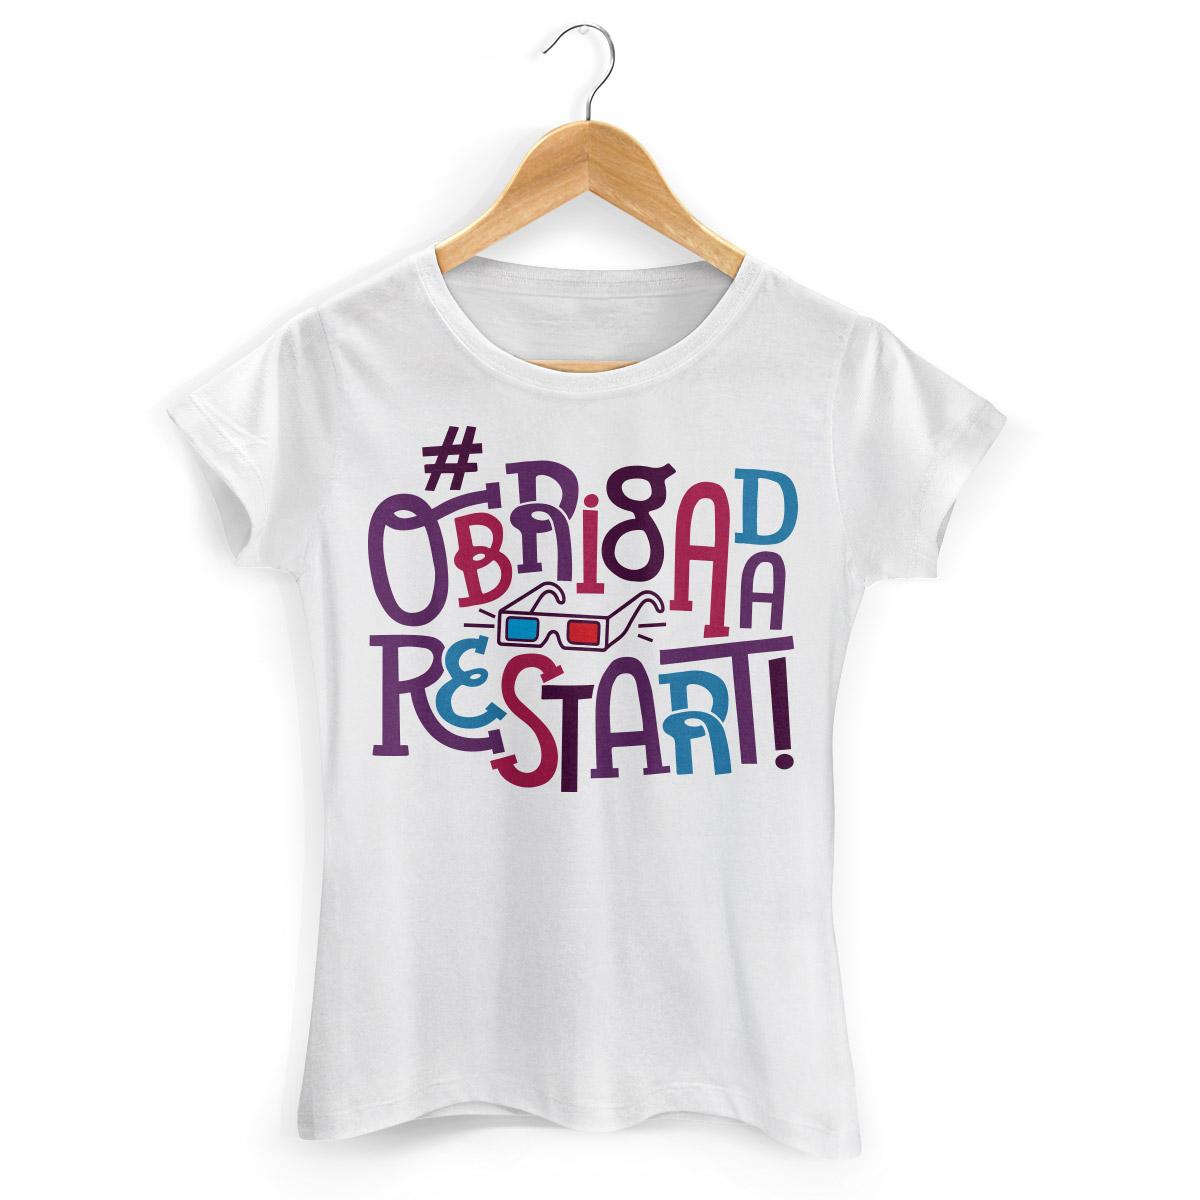 Camiseta Feminina #ObrigadaRestart